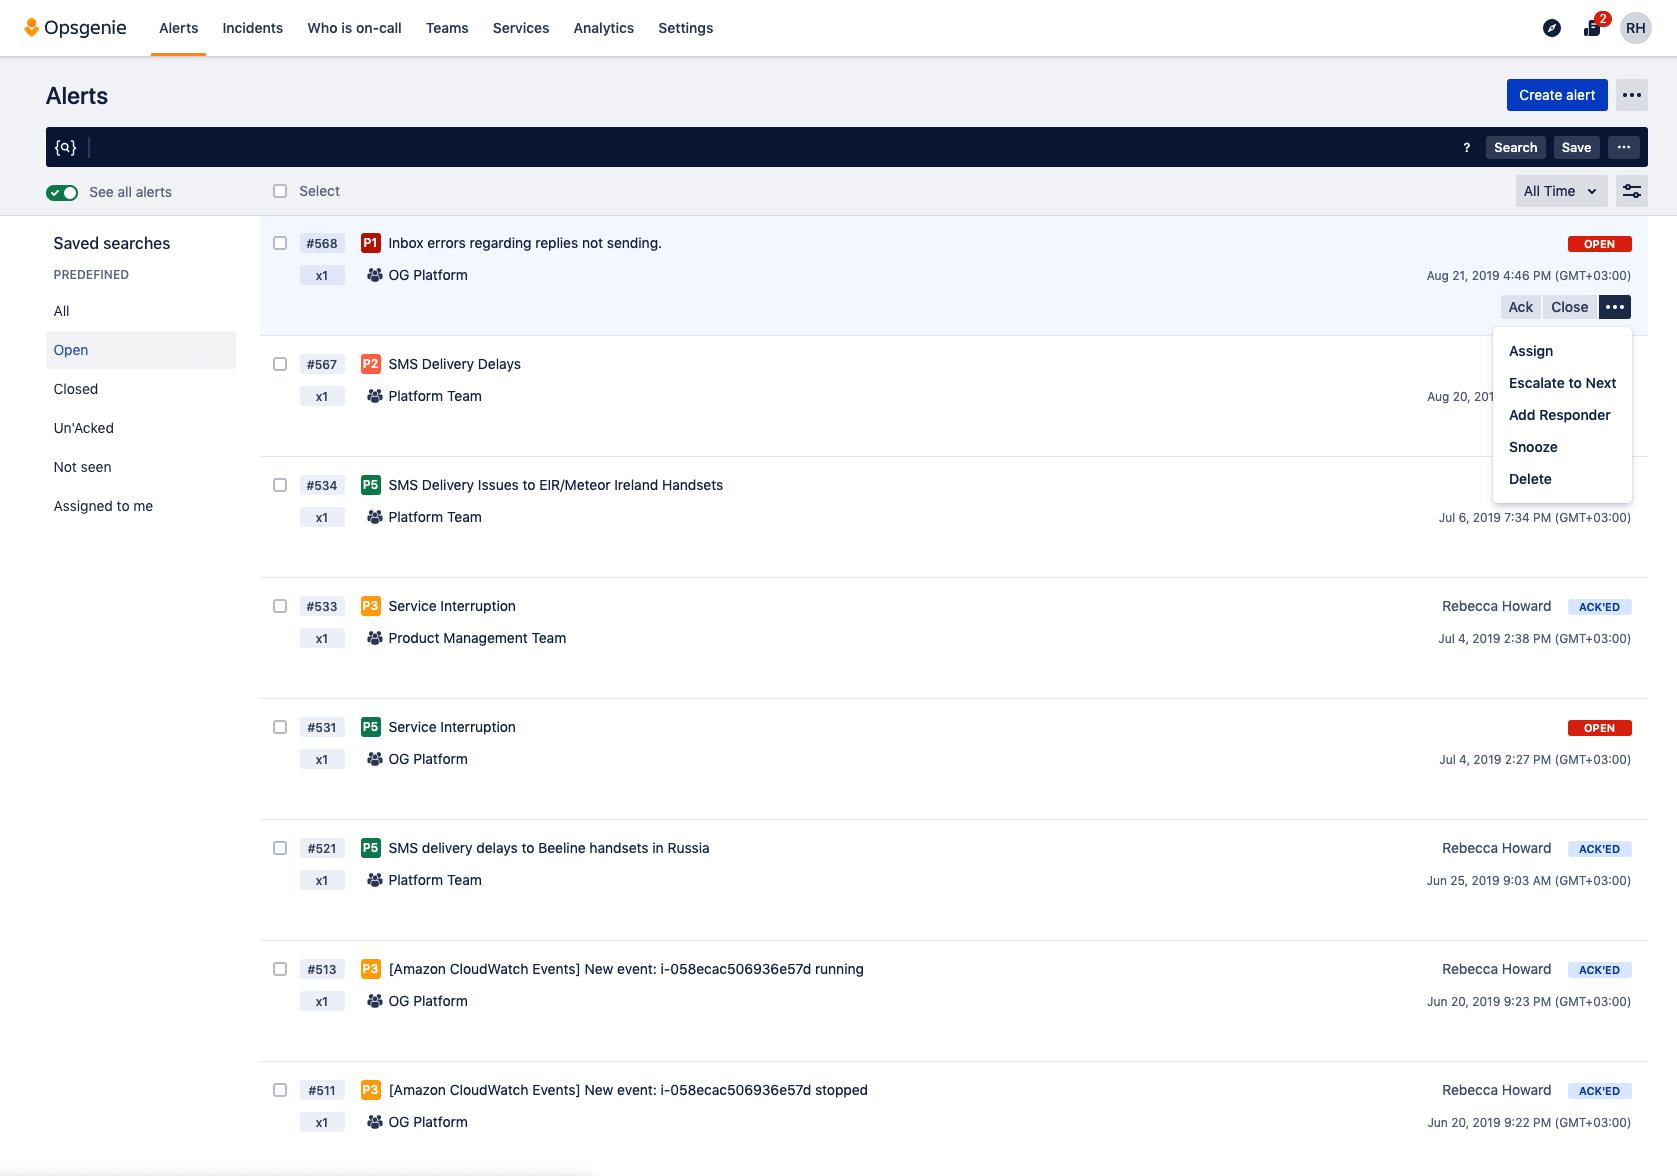 Screenshot of assigning alerts